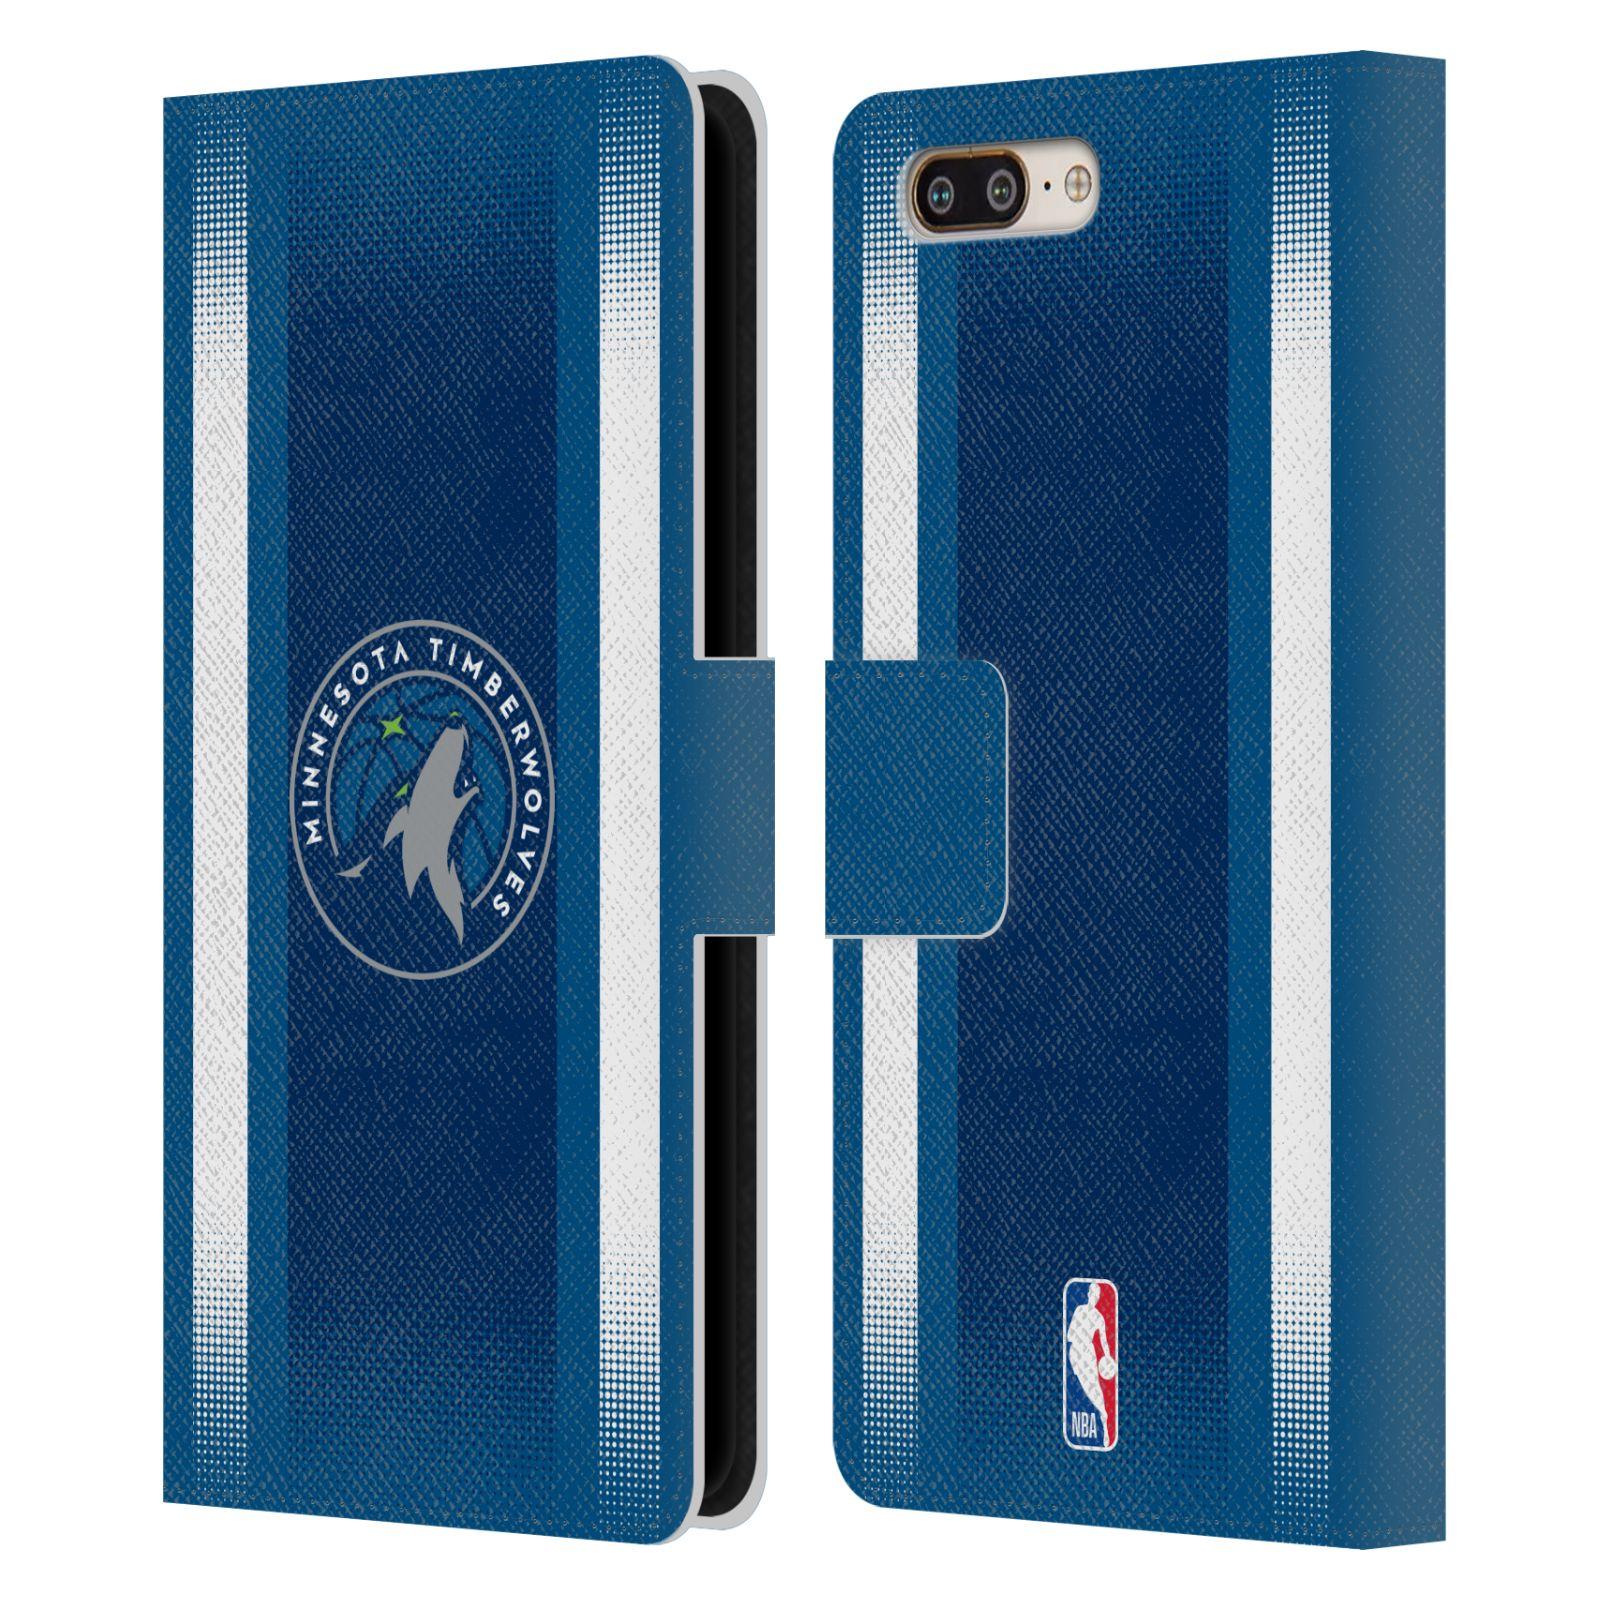 UFFICIALE-NBA-MINNESOTA-TIMBERWOLVES-COVER-A-PORTAFOGLIO-PER-BLACKBERRY-ONEPLUS